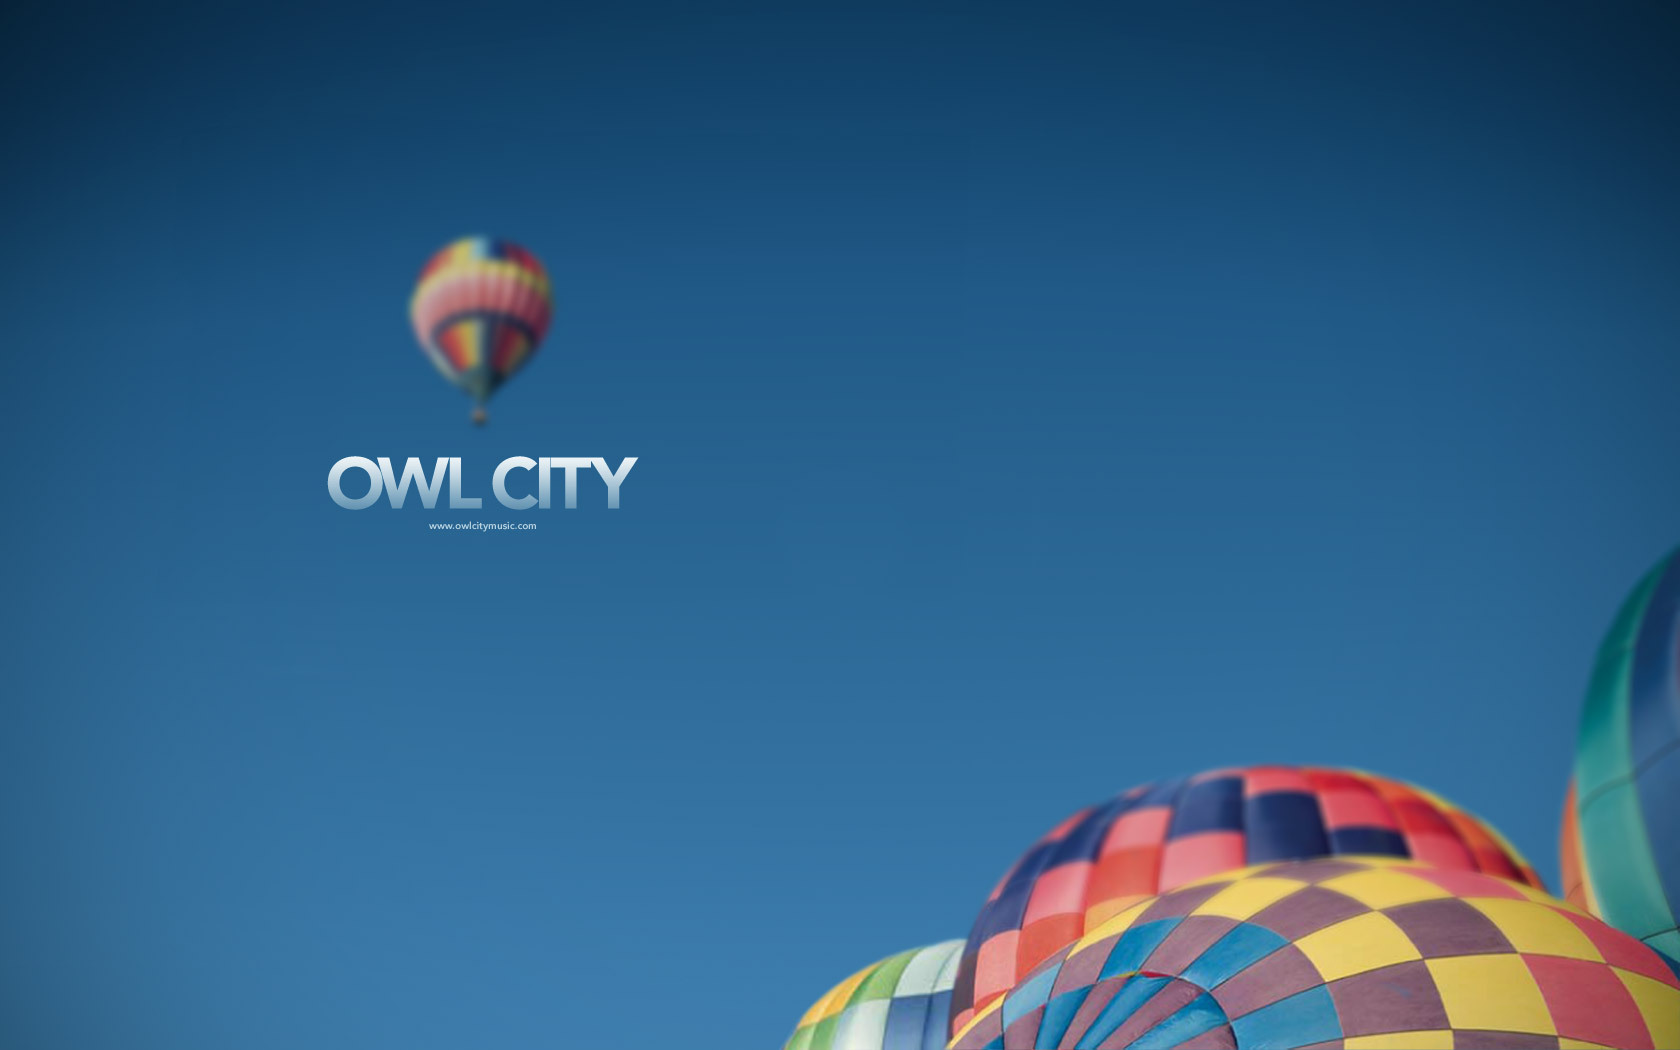 O Owl City Owl City - Owl City Wa...